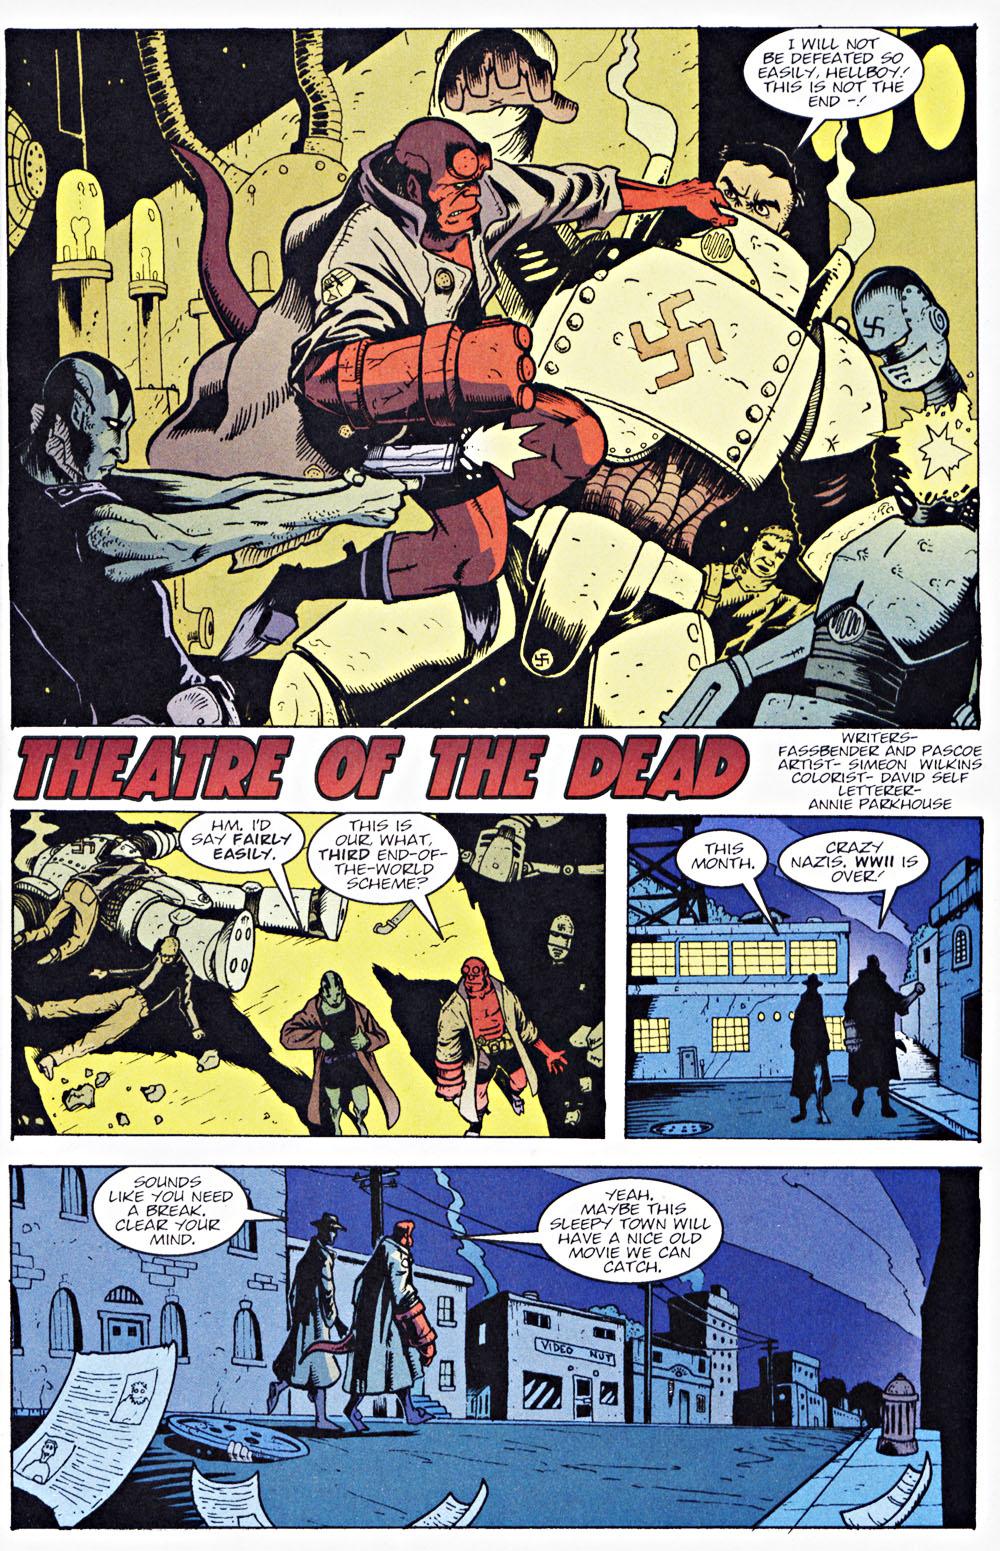 Read online Hellboy: Weird Tales comic -  Issue #7 - 11